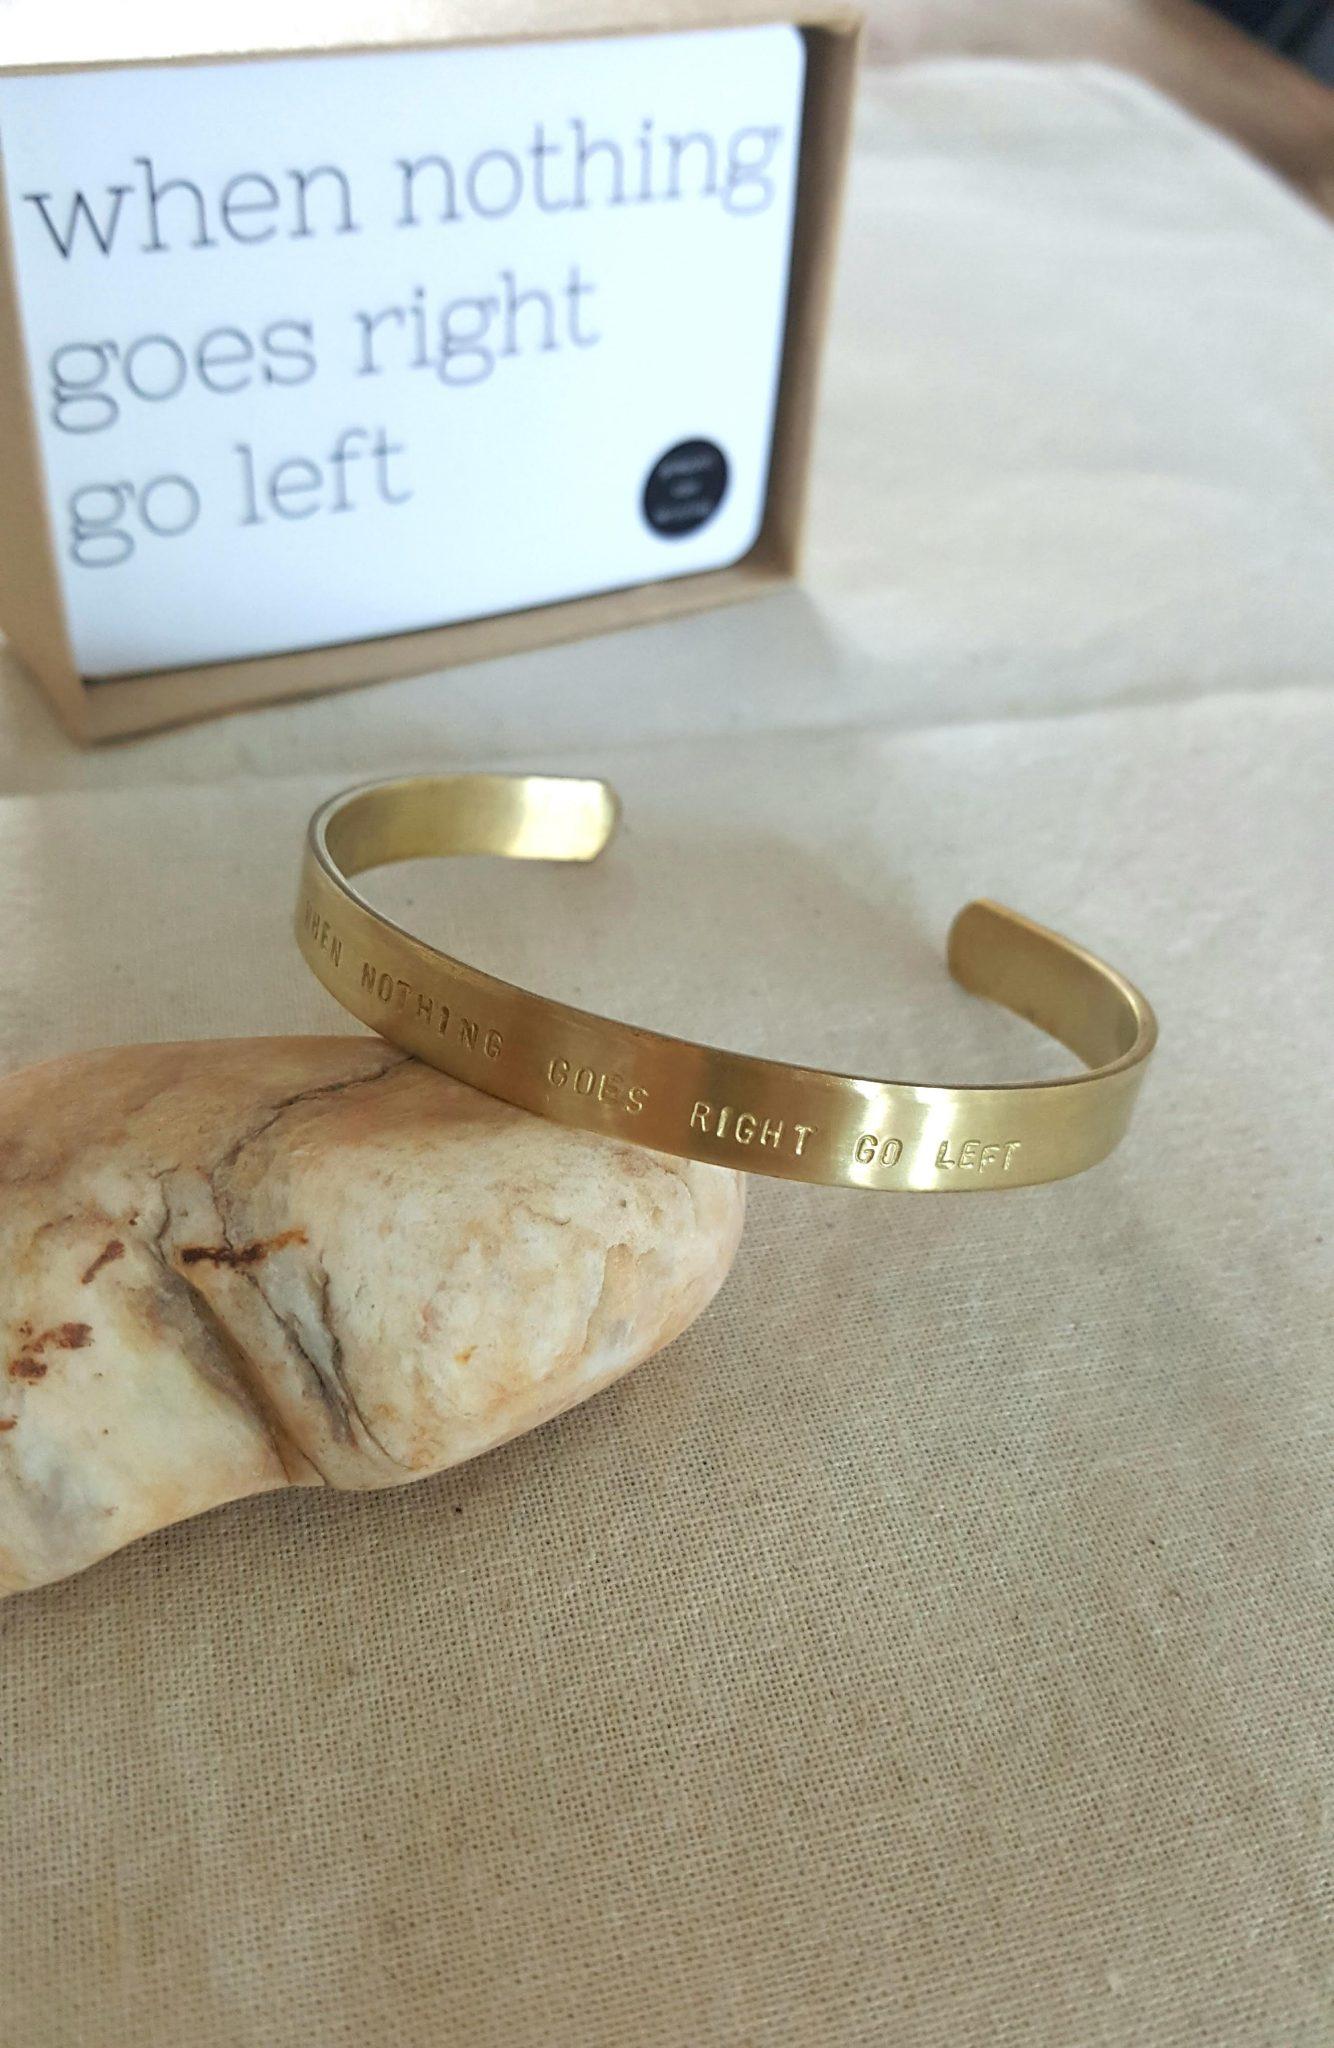 peptalk-bracelet-whe-nothing-goes-right-go-left-sticktails